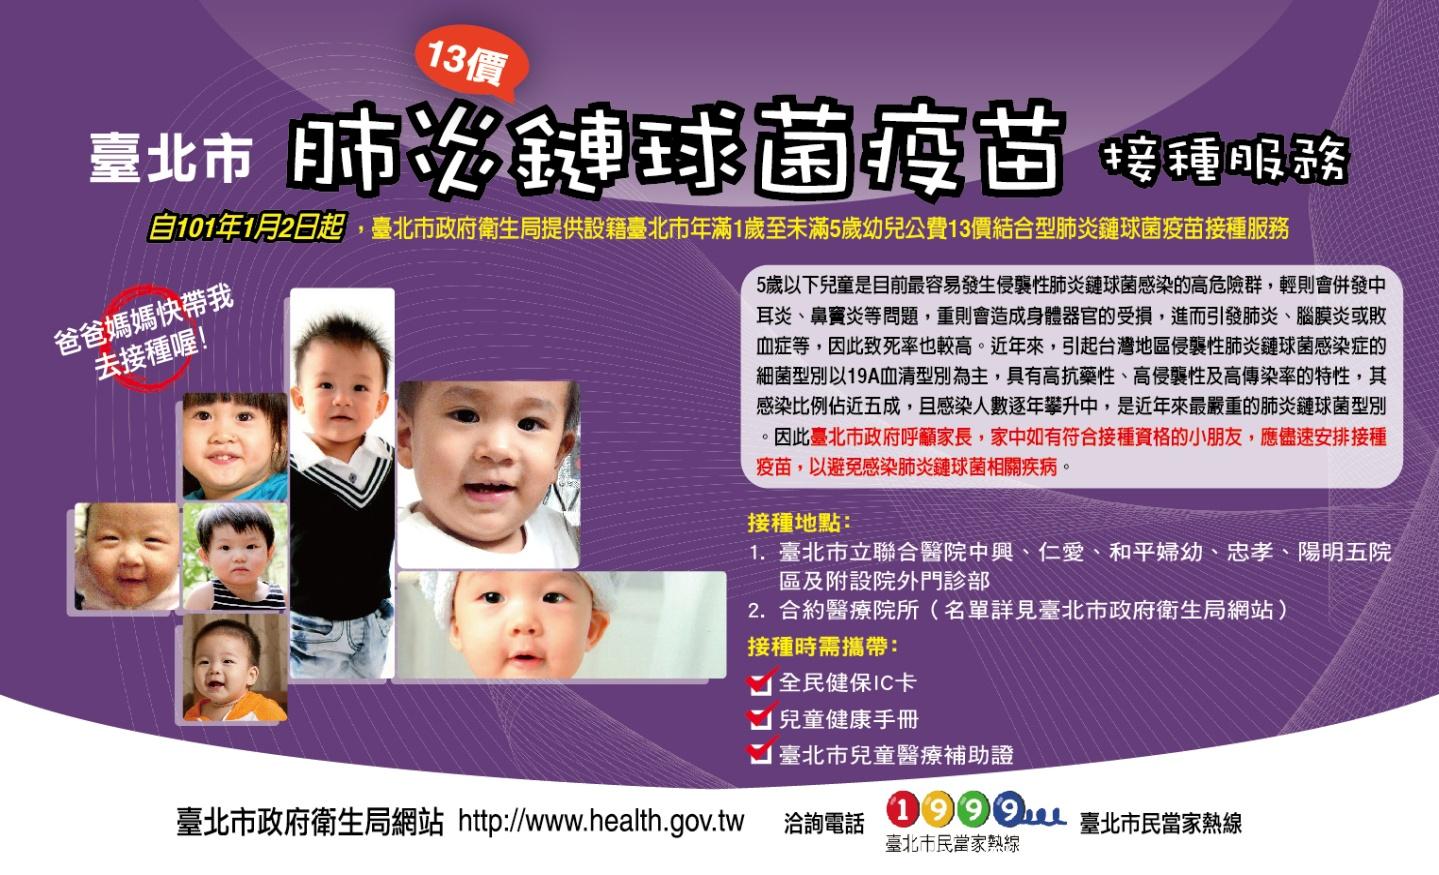 Immunization services of pneumococcal 13-valent conjugate vaccine in Taipei City.